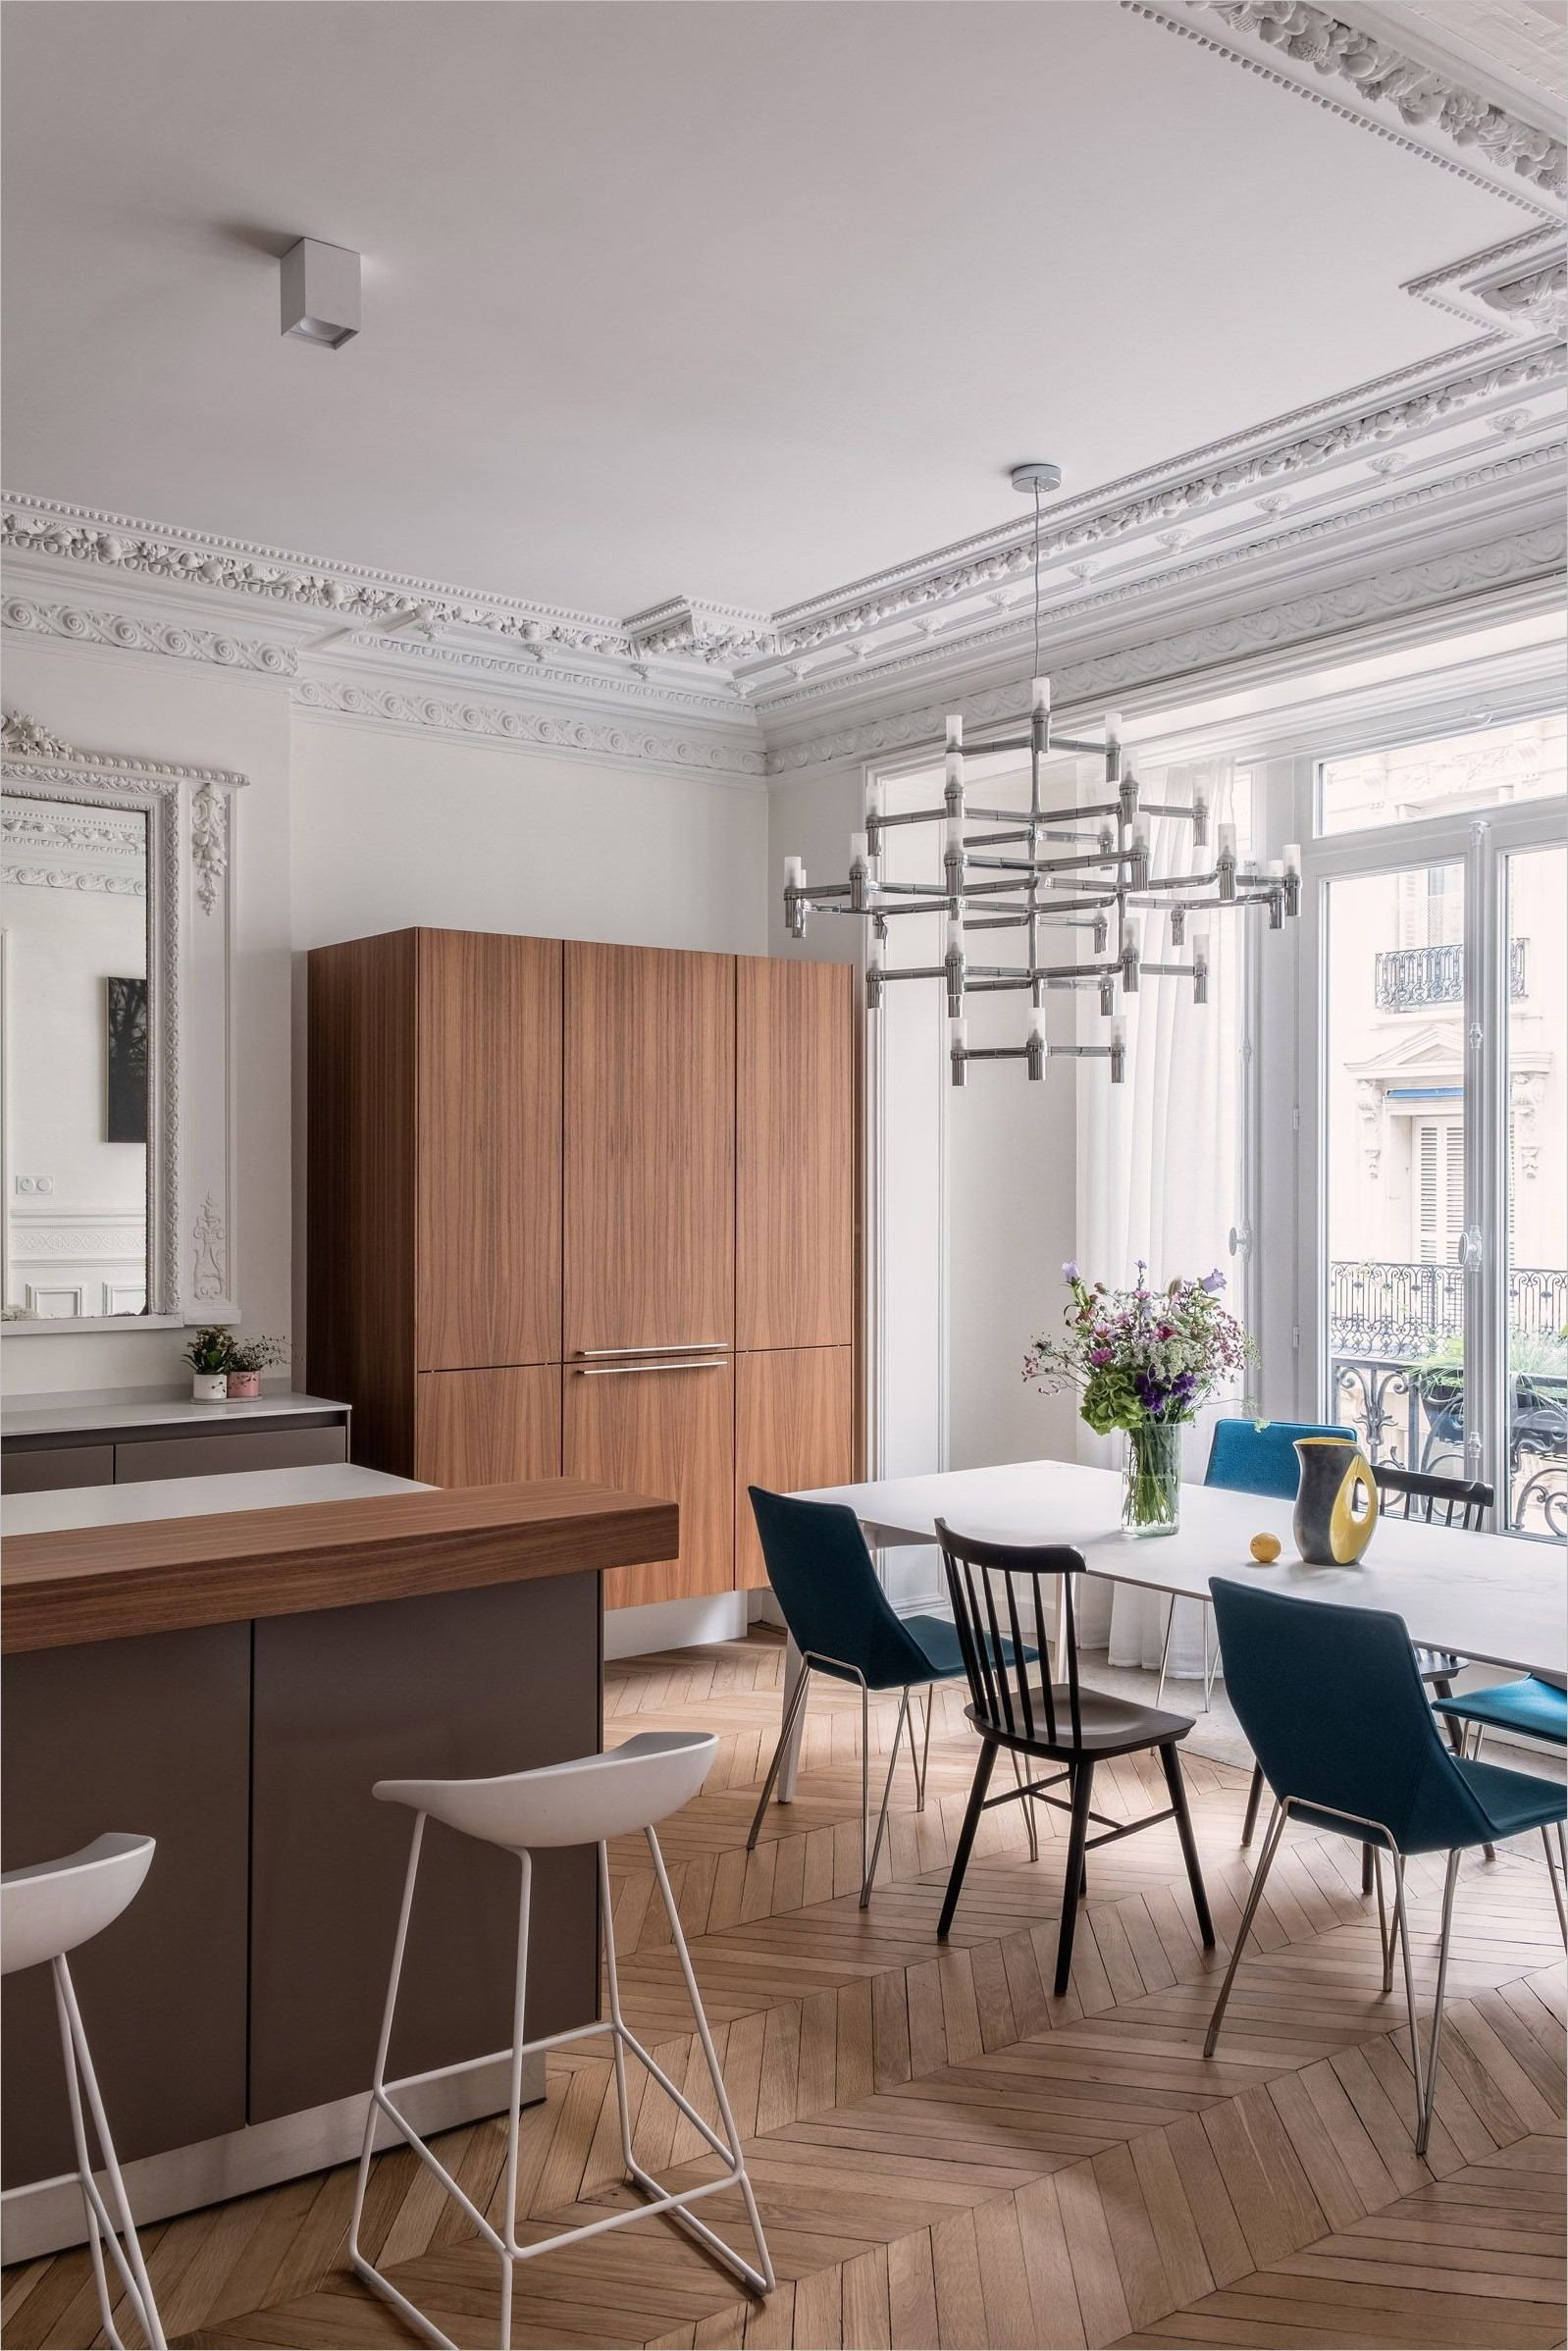 Design Salon Salle A Manger tendance deco salon salle a manger 2017 | interior design